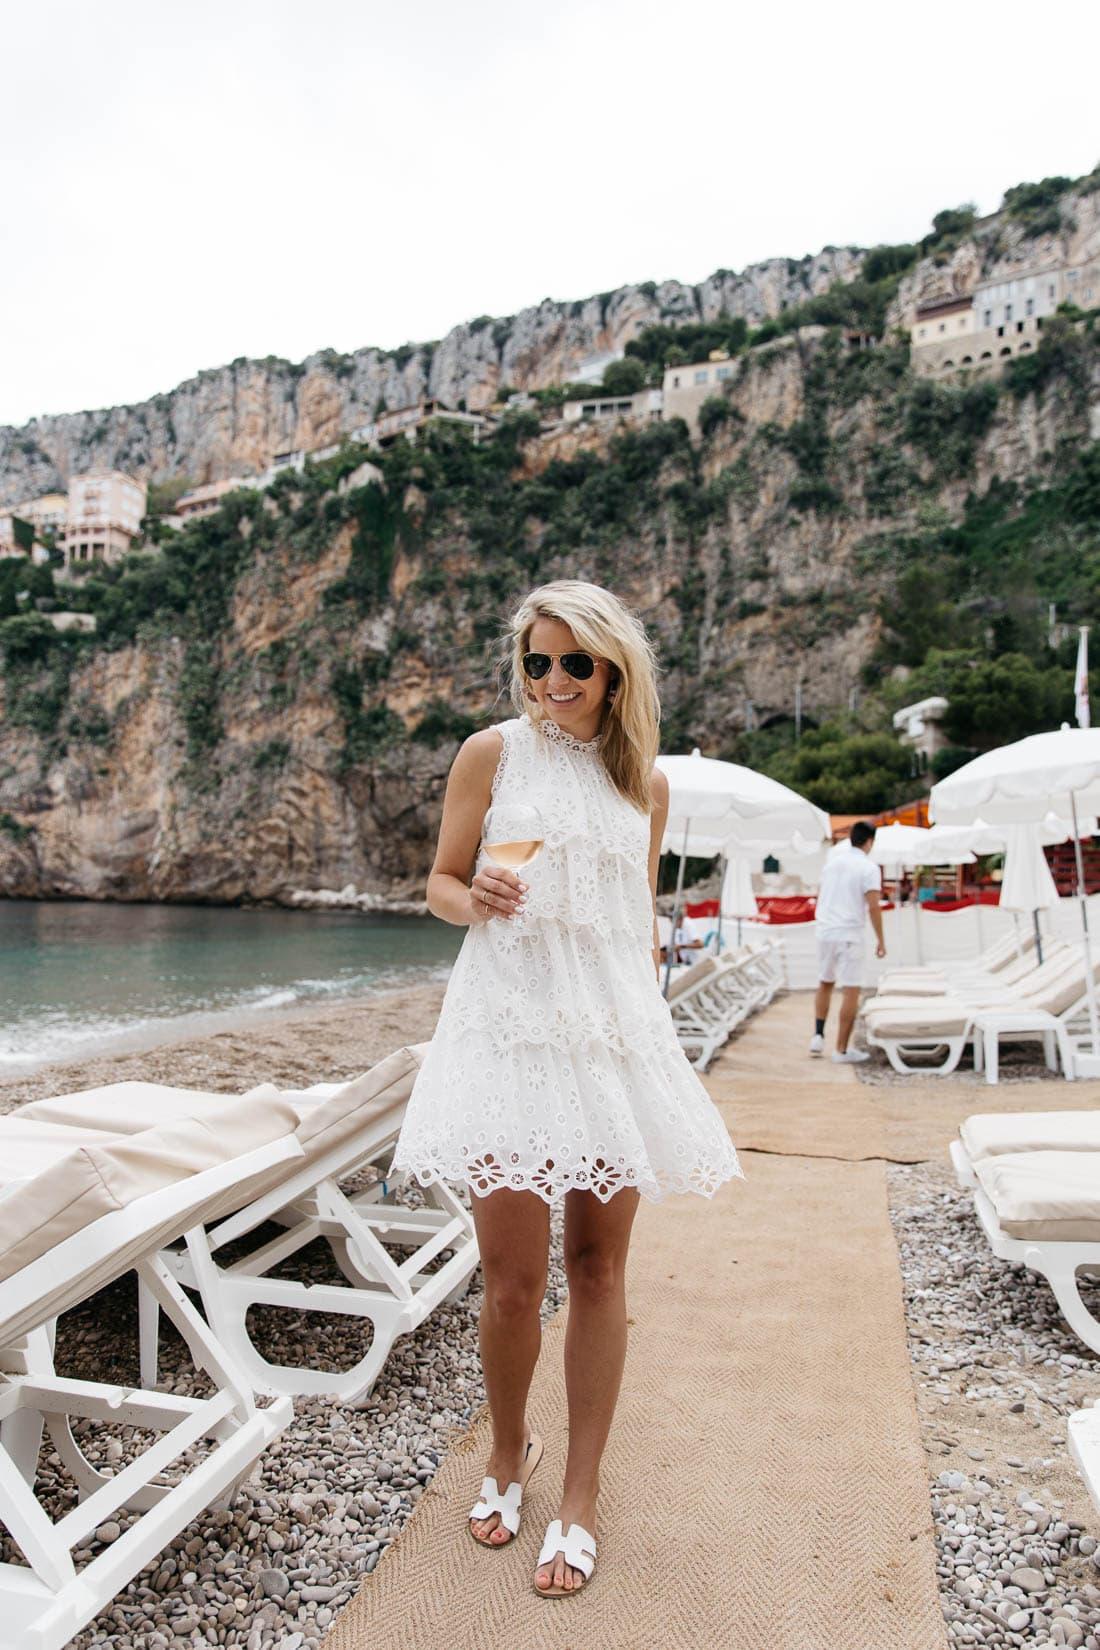 Hidden beach club in the South of France